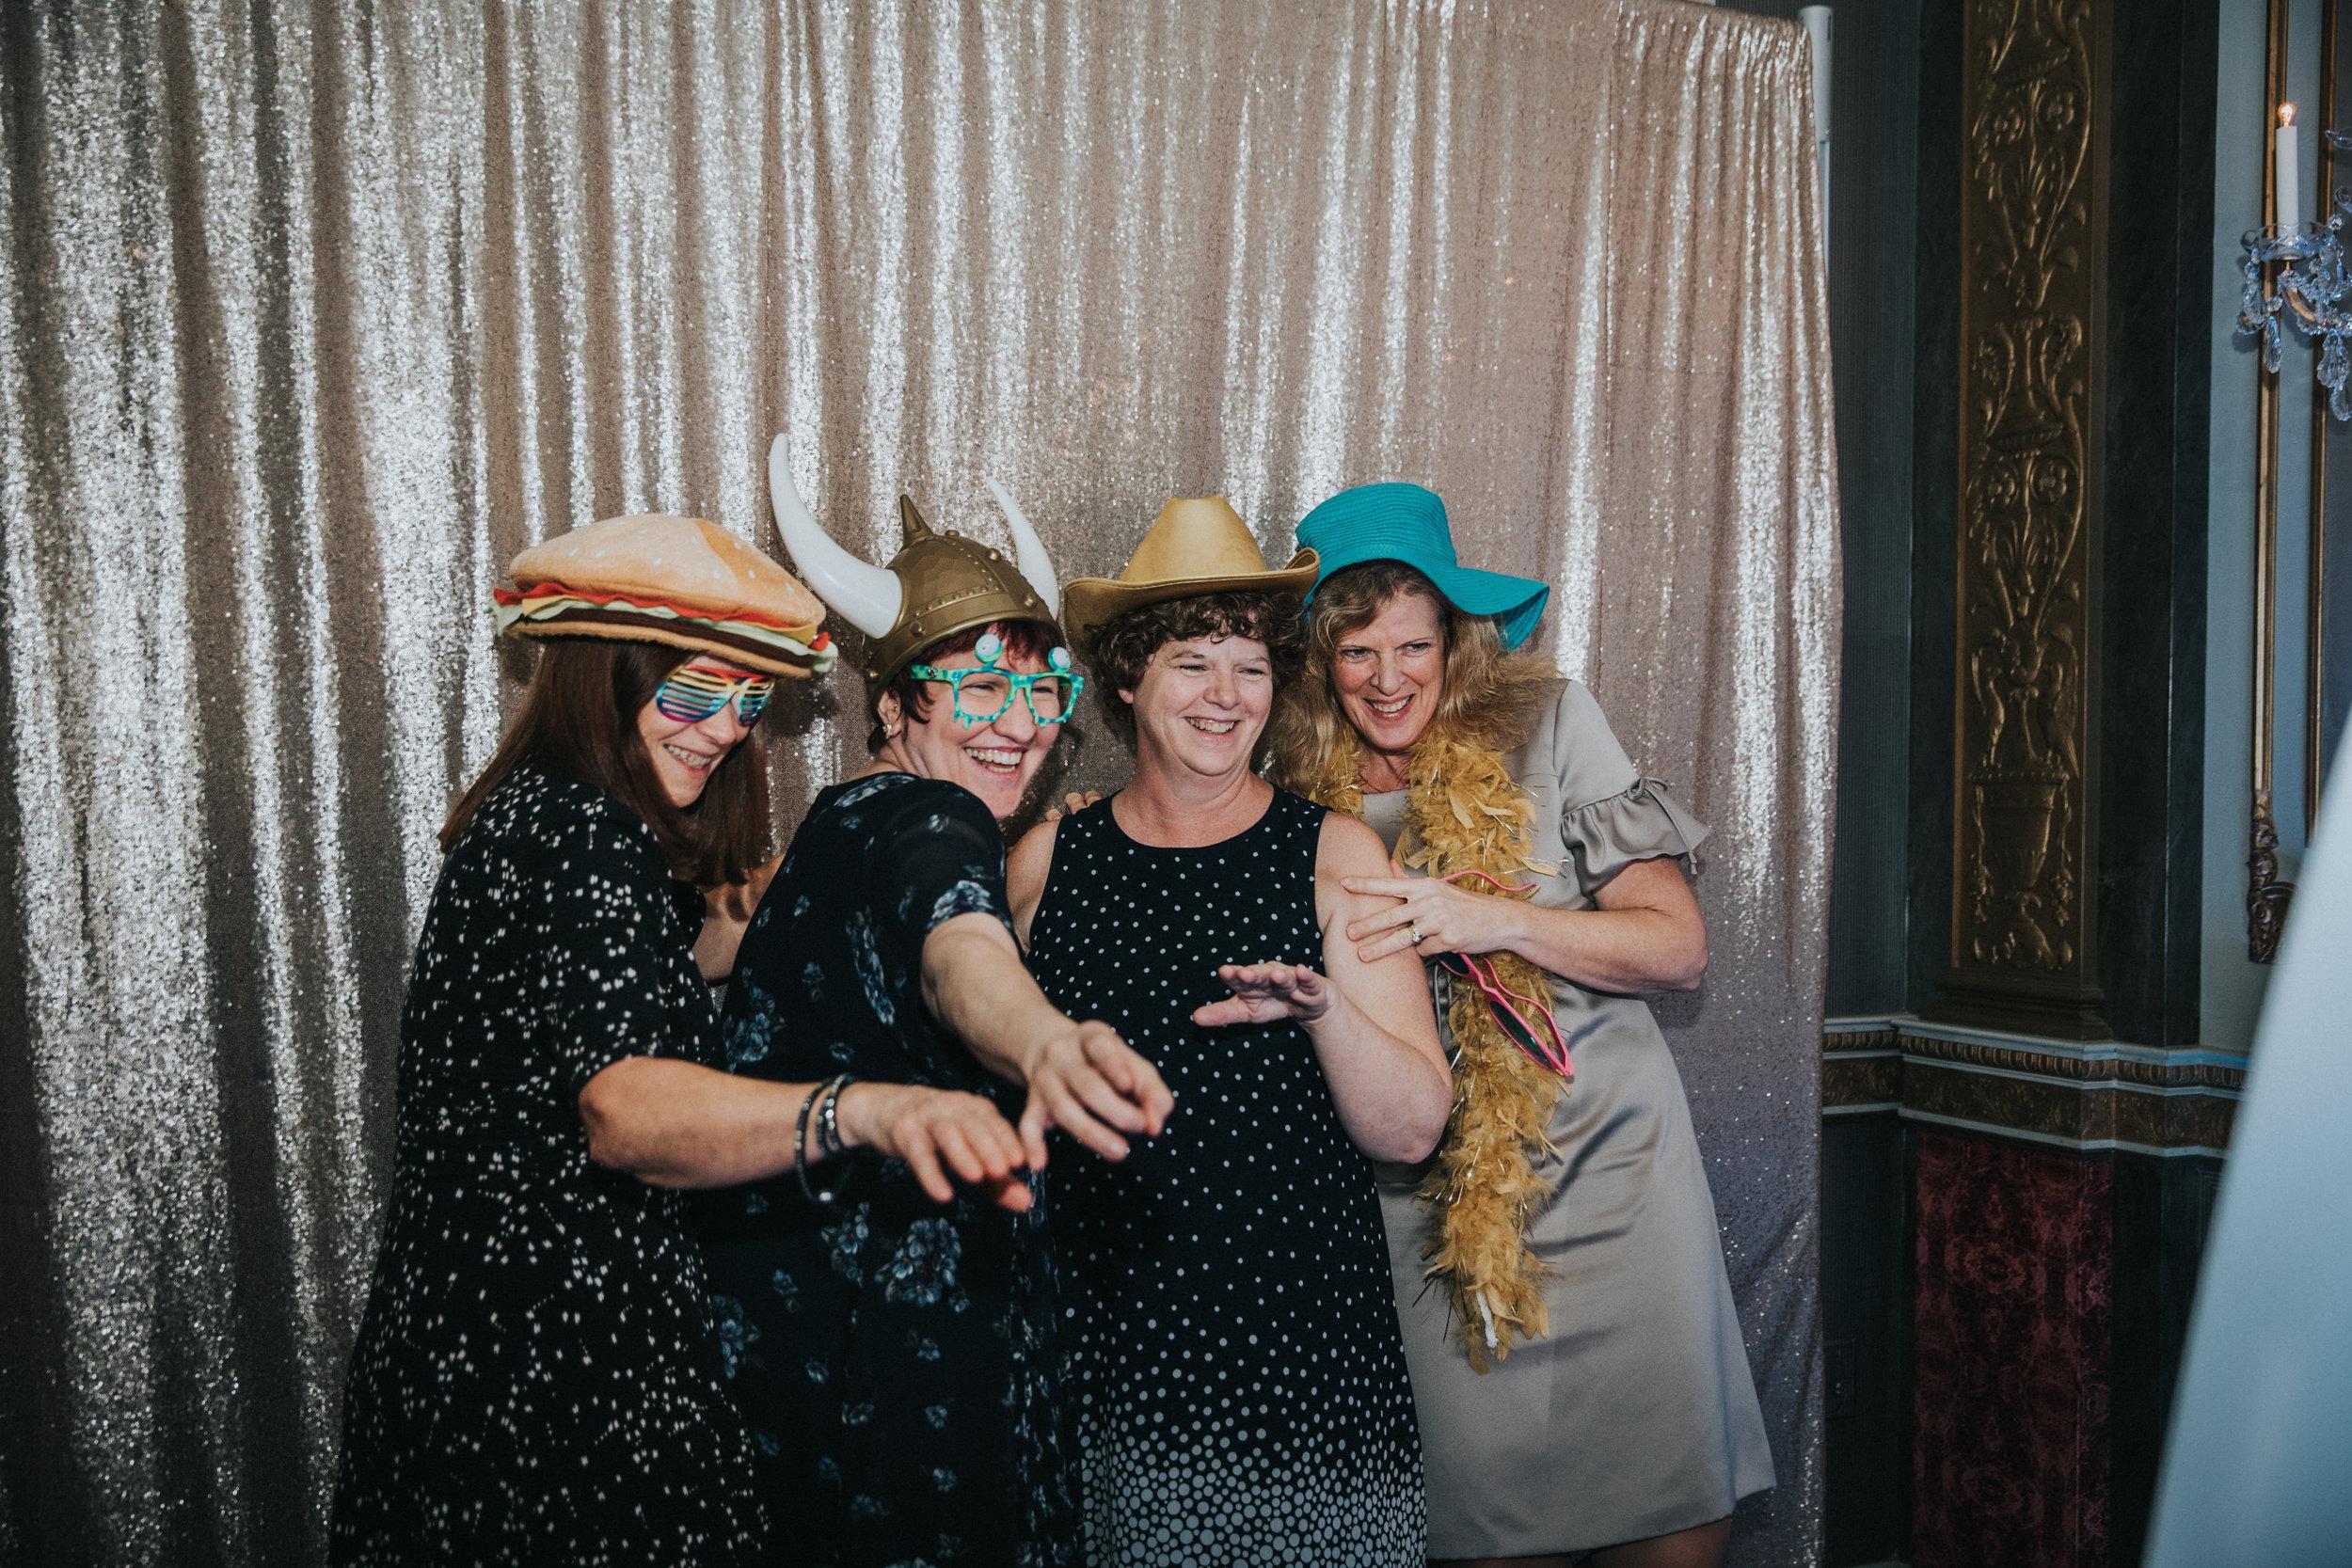 New-Jersey-Wedding-Photography-Fishers-Tudor-House-JennaLynnPhotography-Reception-Kathleen&Eddie-201.jpg